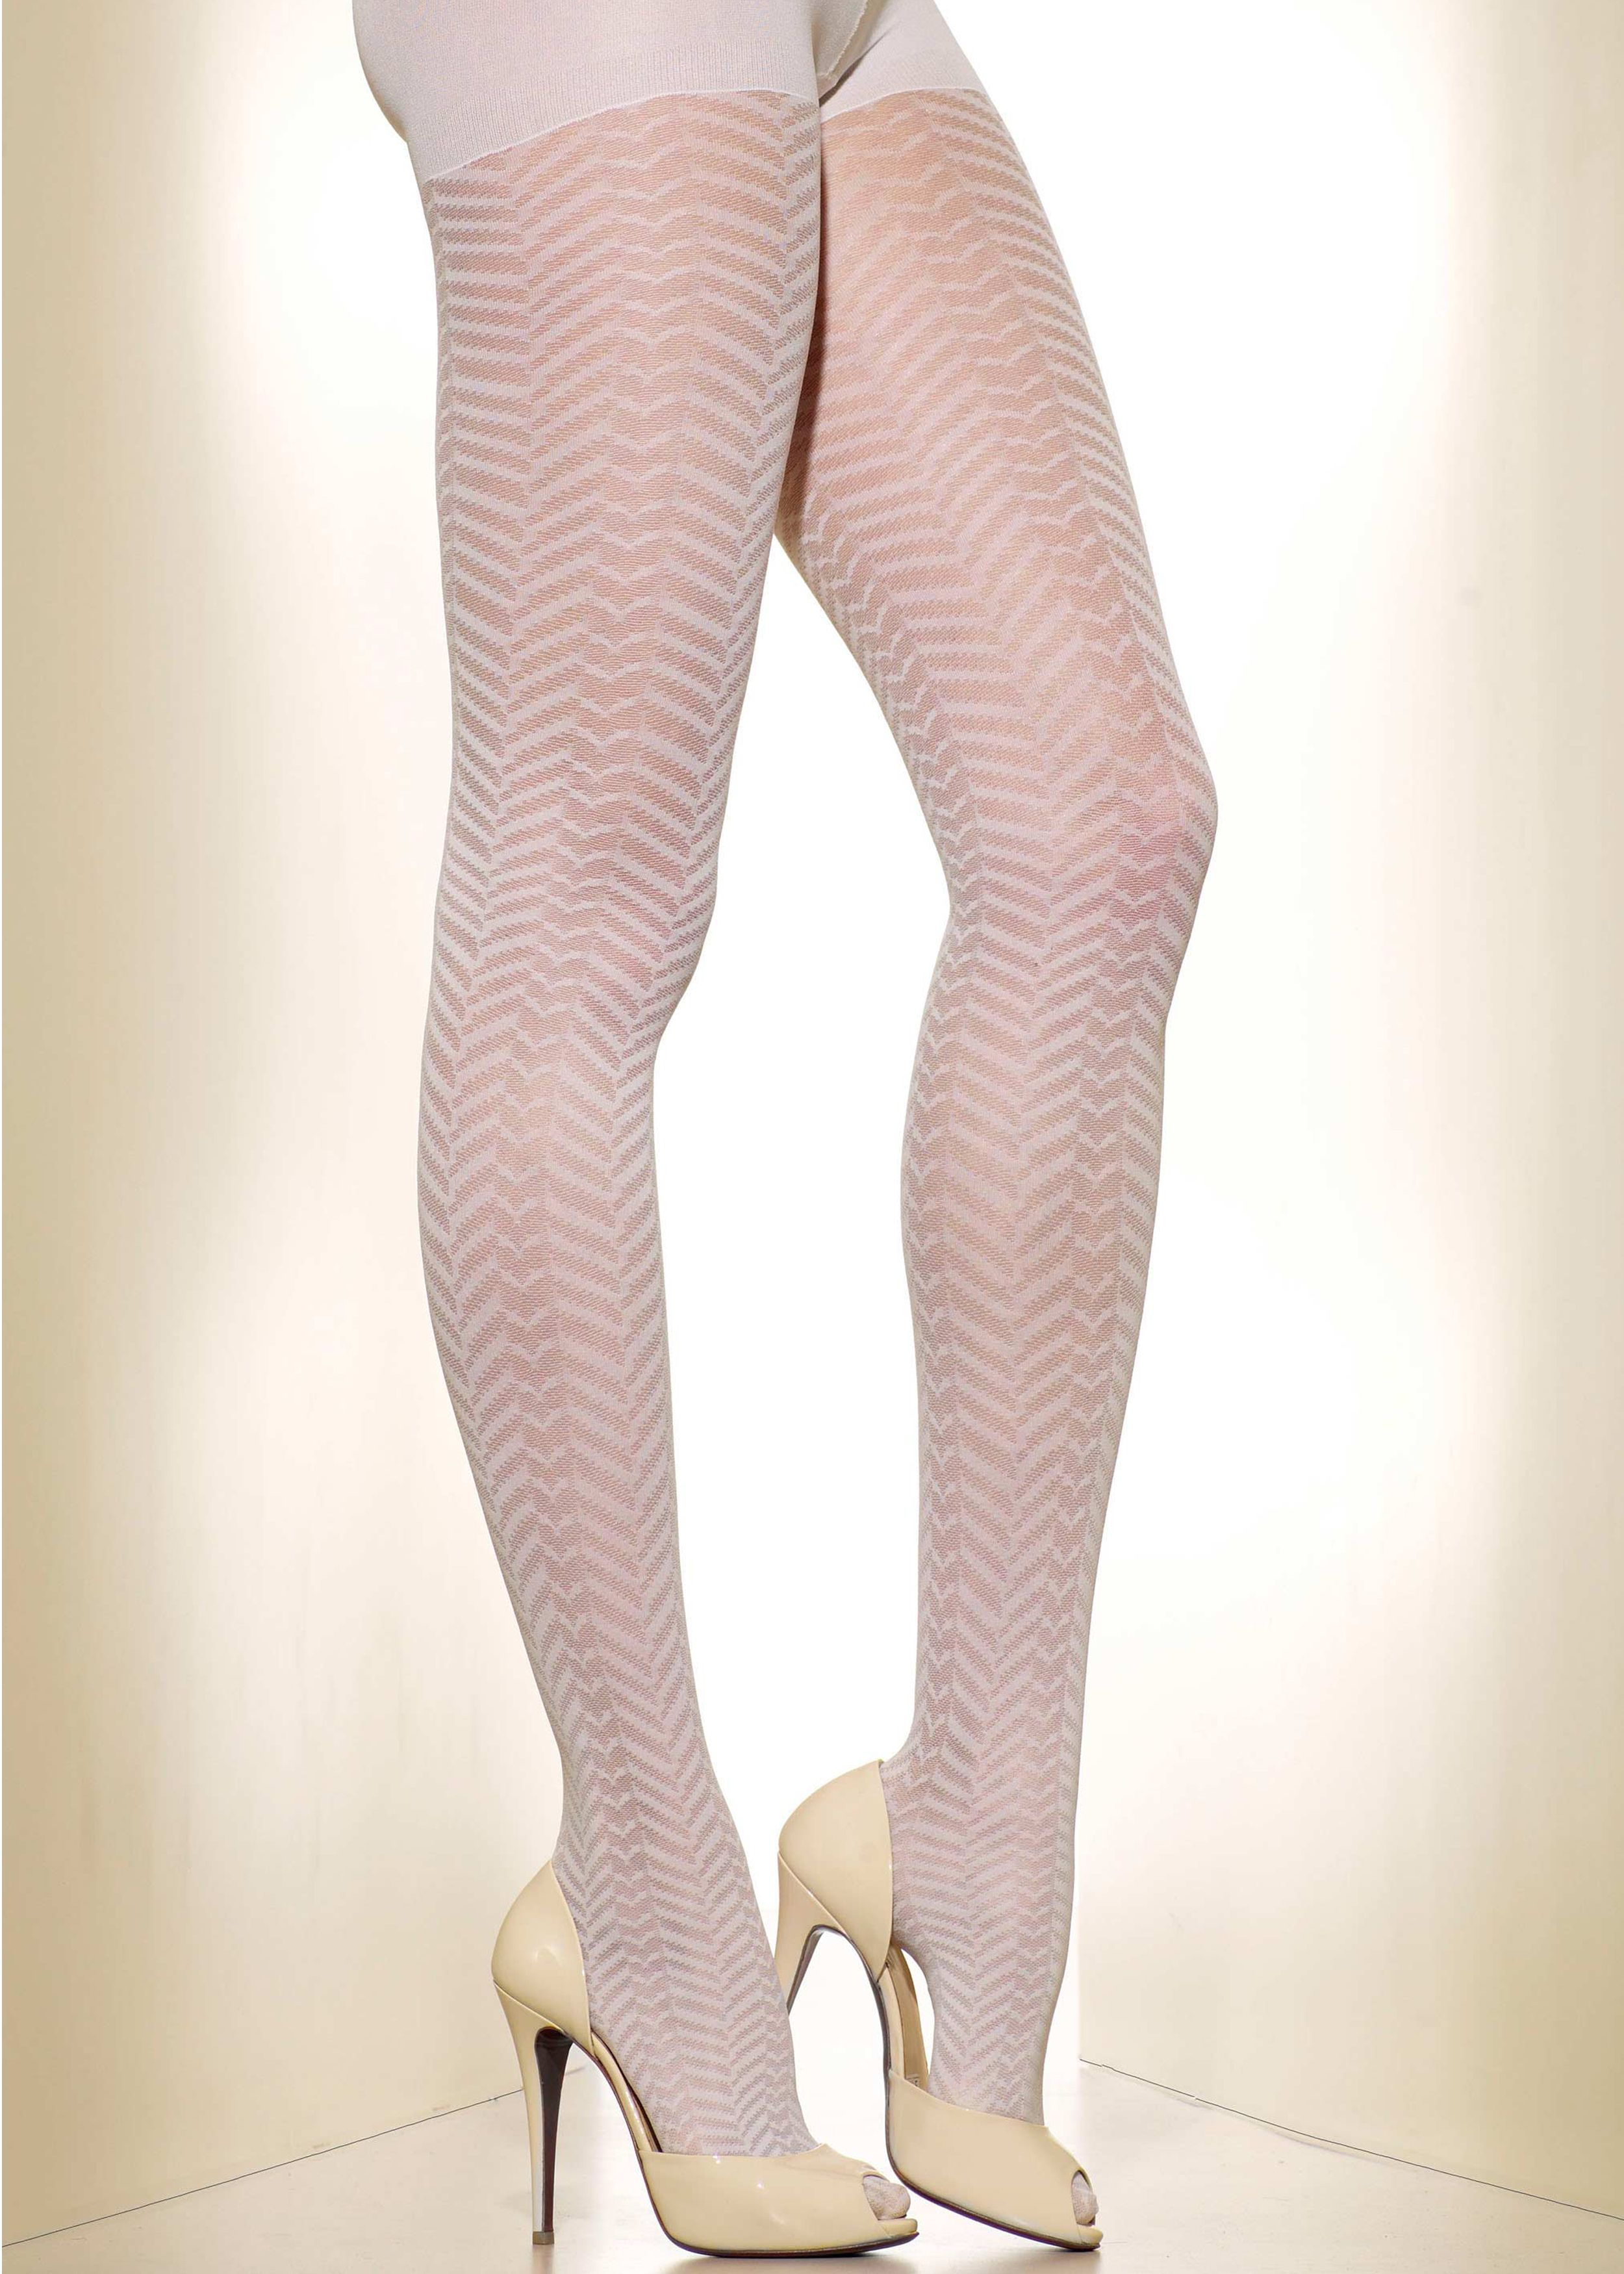 Pantyhose toeless plus size